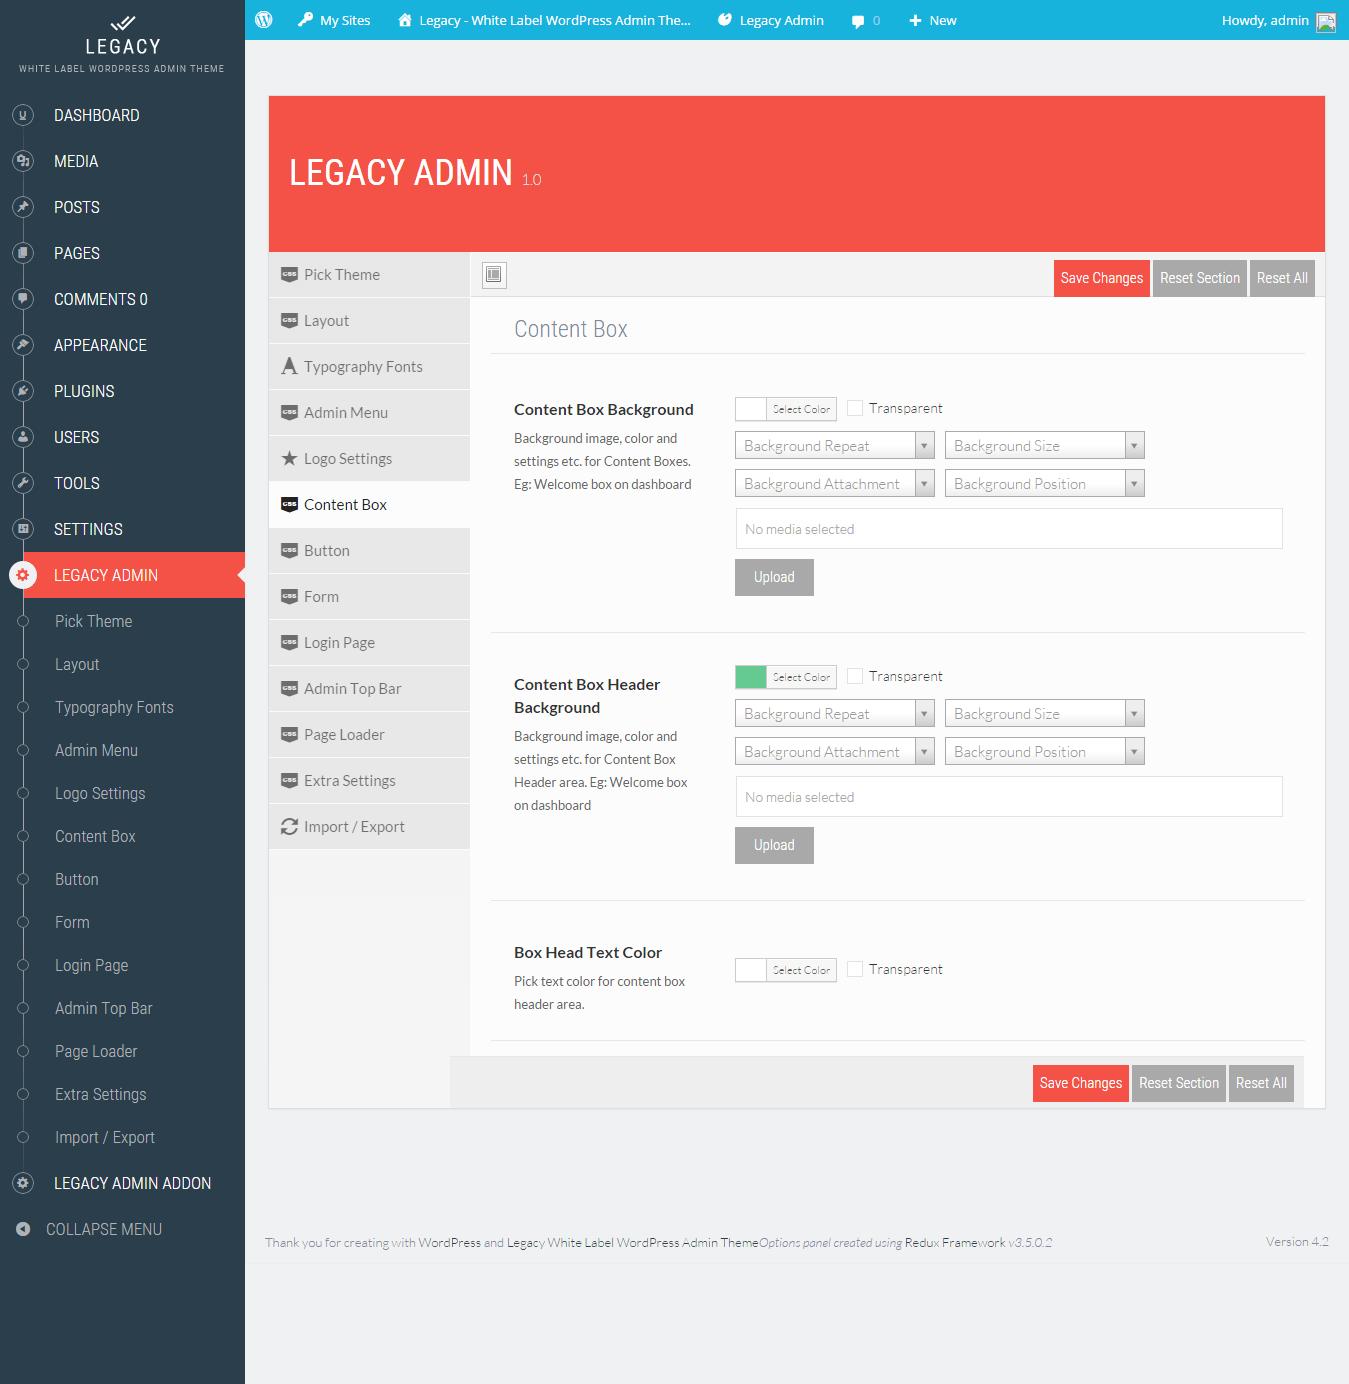 Legacy - White label WordPress Admin Theme by themepassion ...